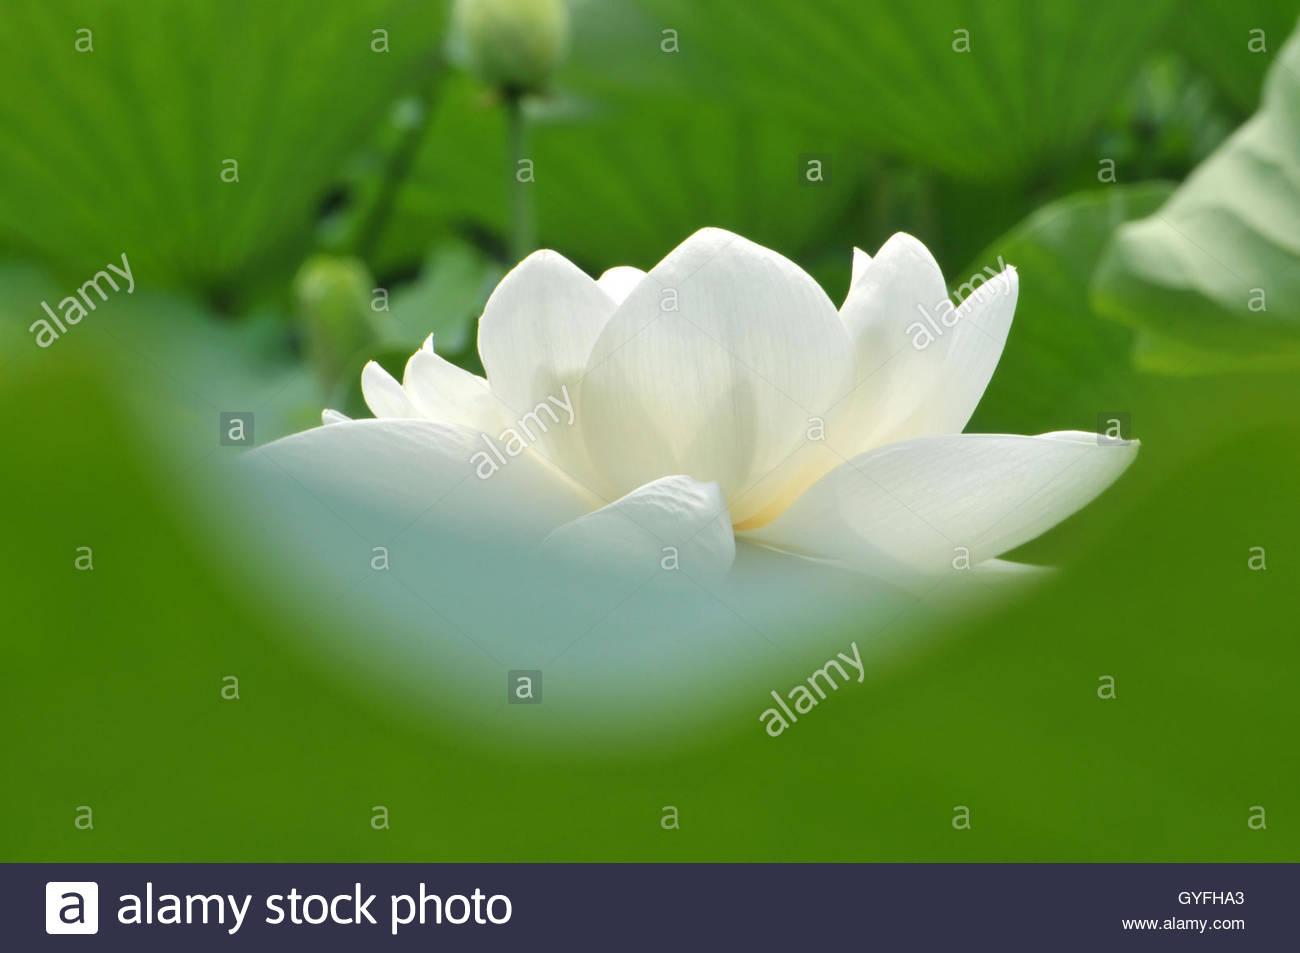 Blossom White Lotus Flower In Pond Stock Photo 120200811 Alamy